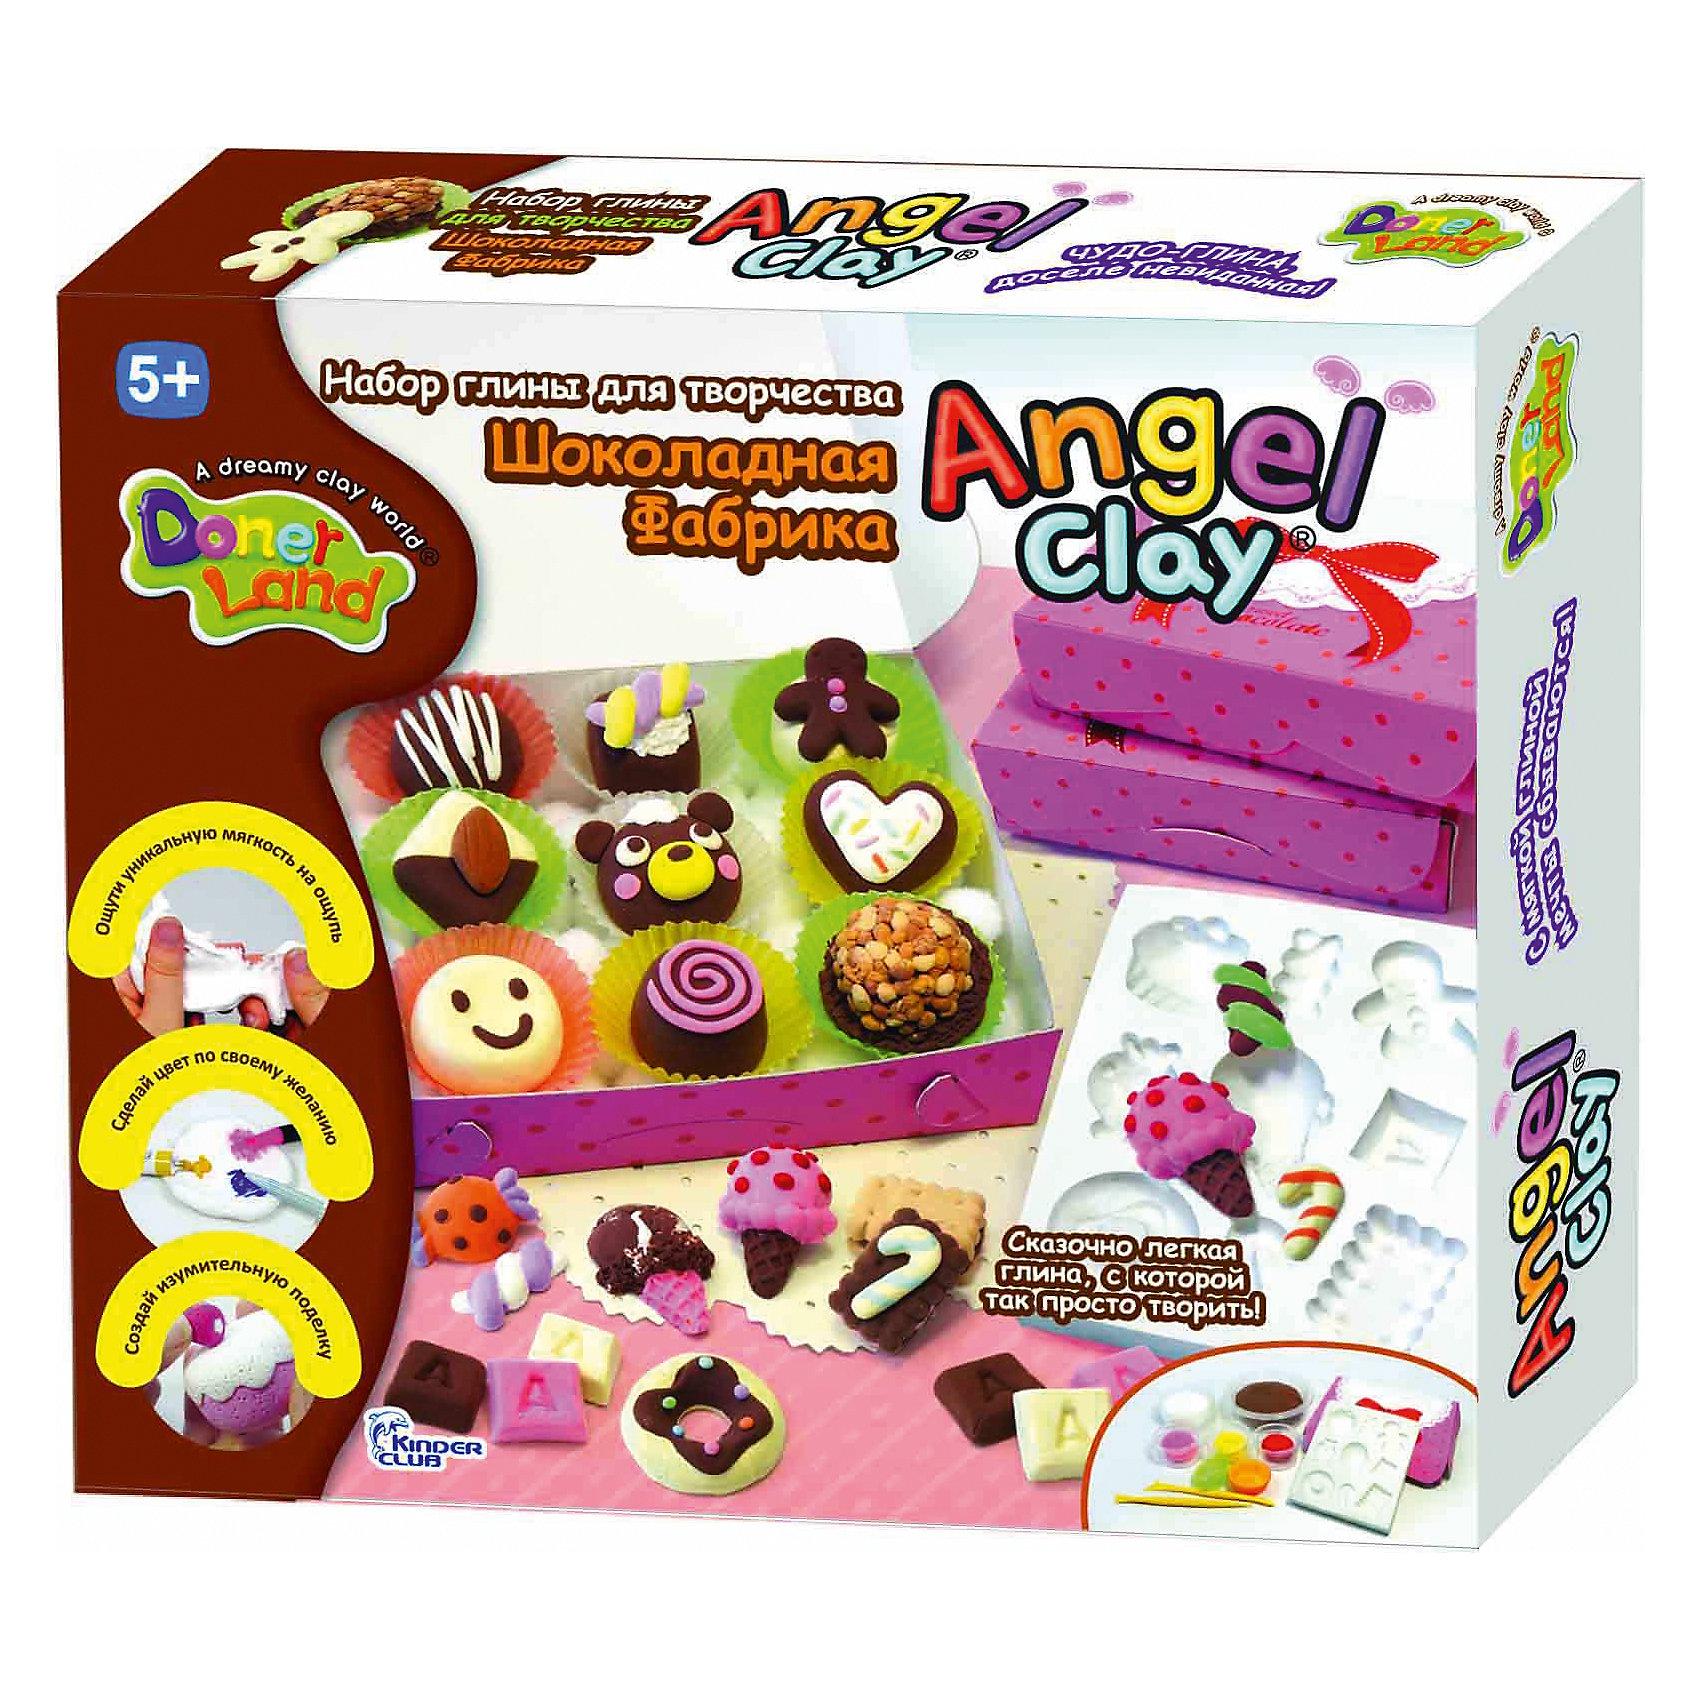 Angel Clay Игровой набор для лепки из глины  Sweet  Chocolat, Angel Clay набор для лепки donerland angel clay funny safari aa14021